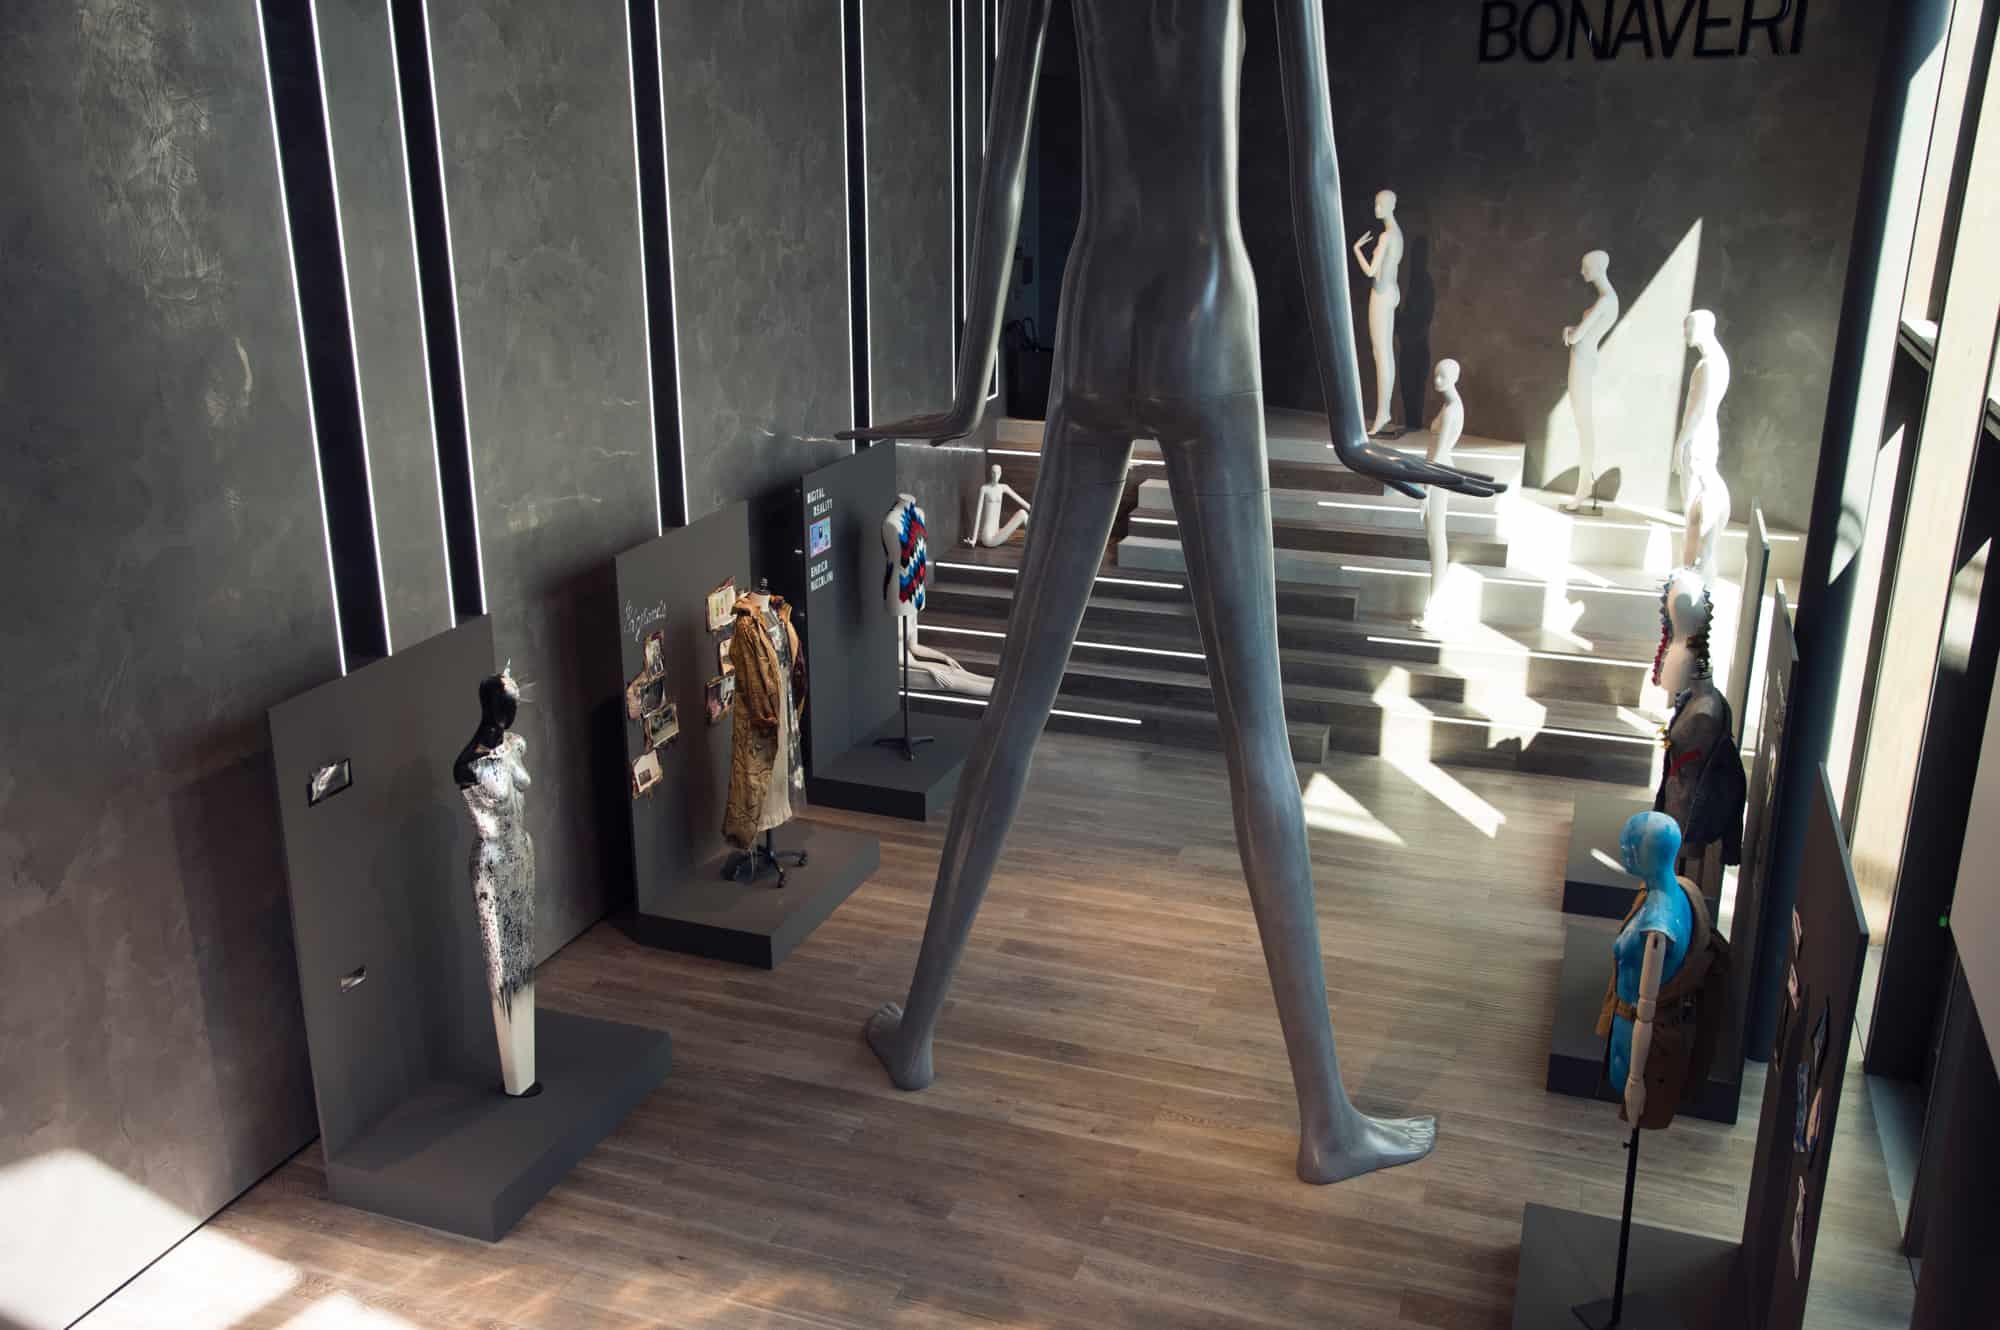 trends-meet-tradition-bonaveri-mannequins-06-1